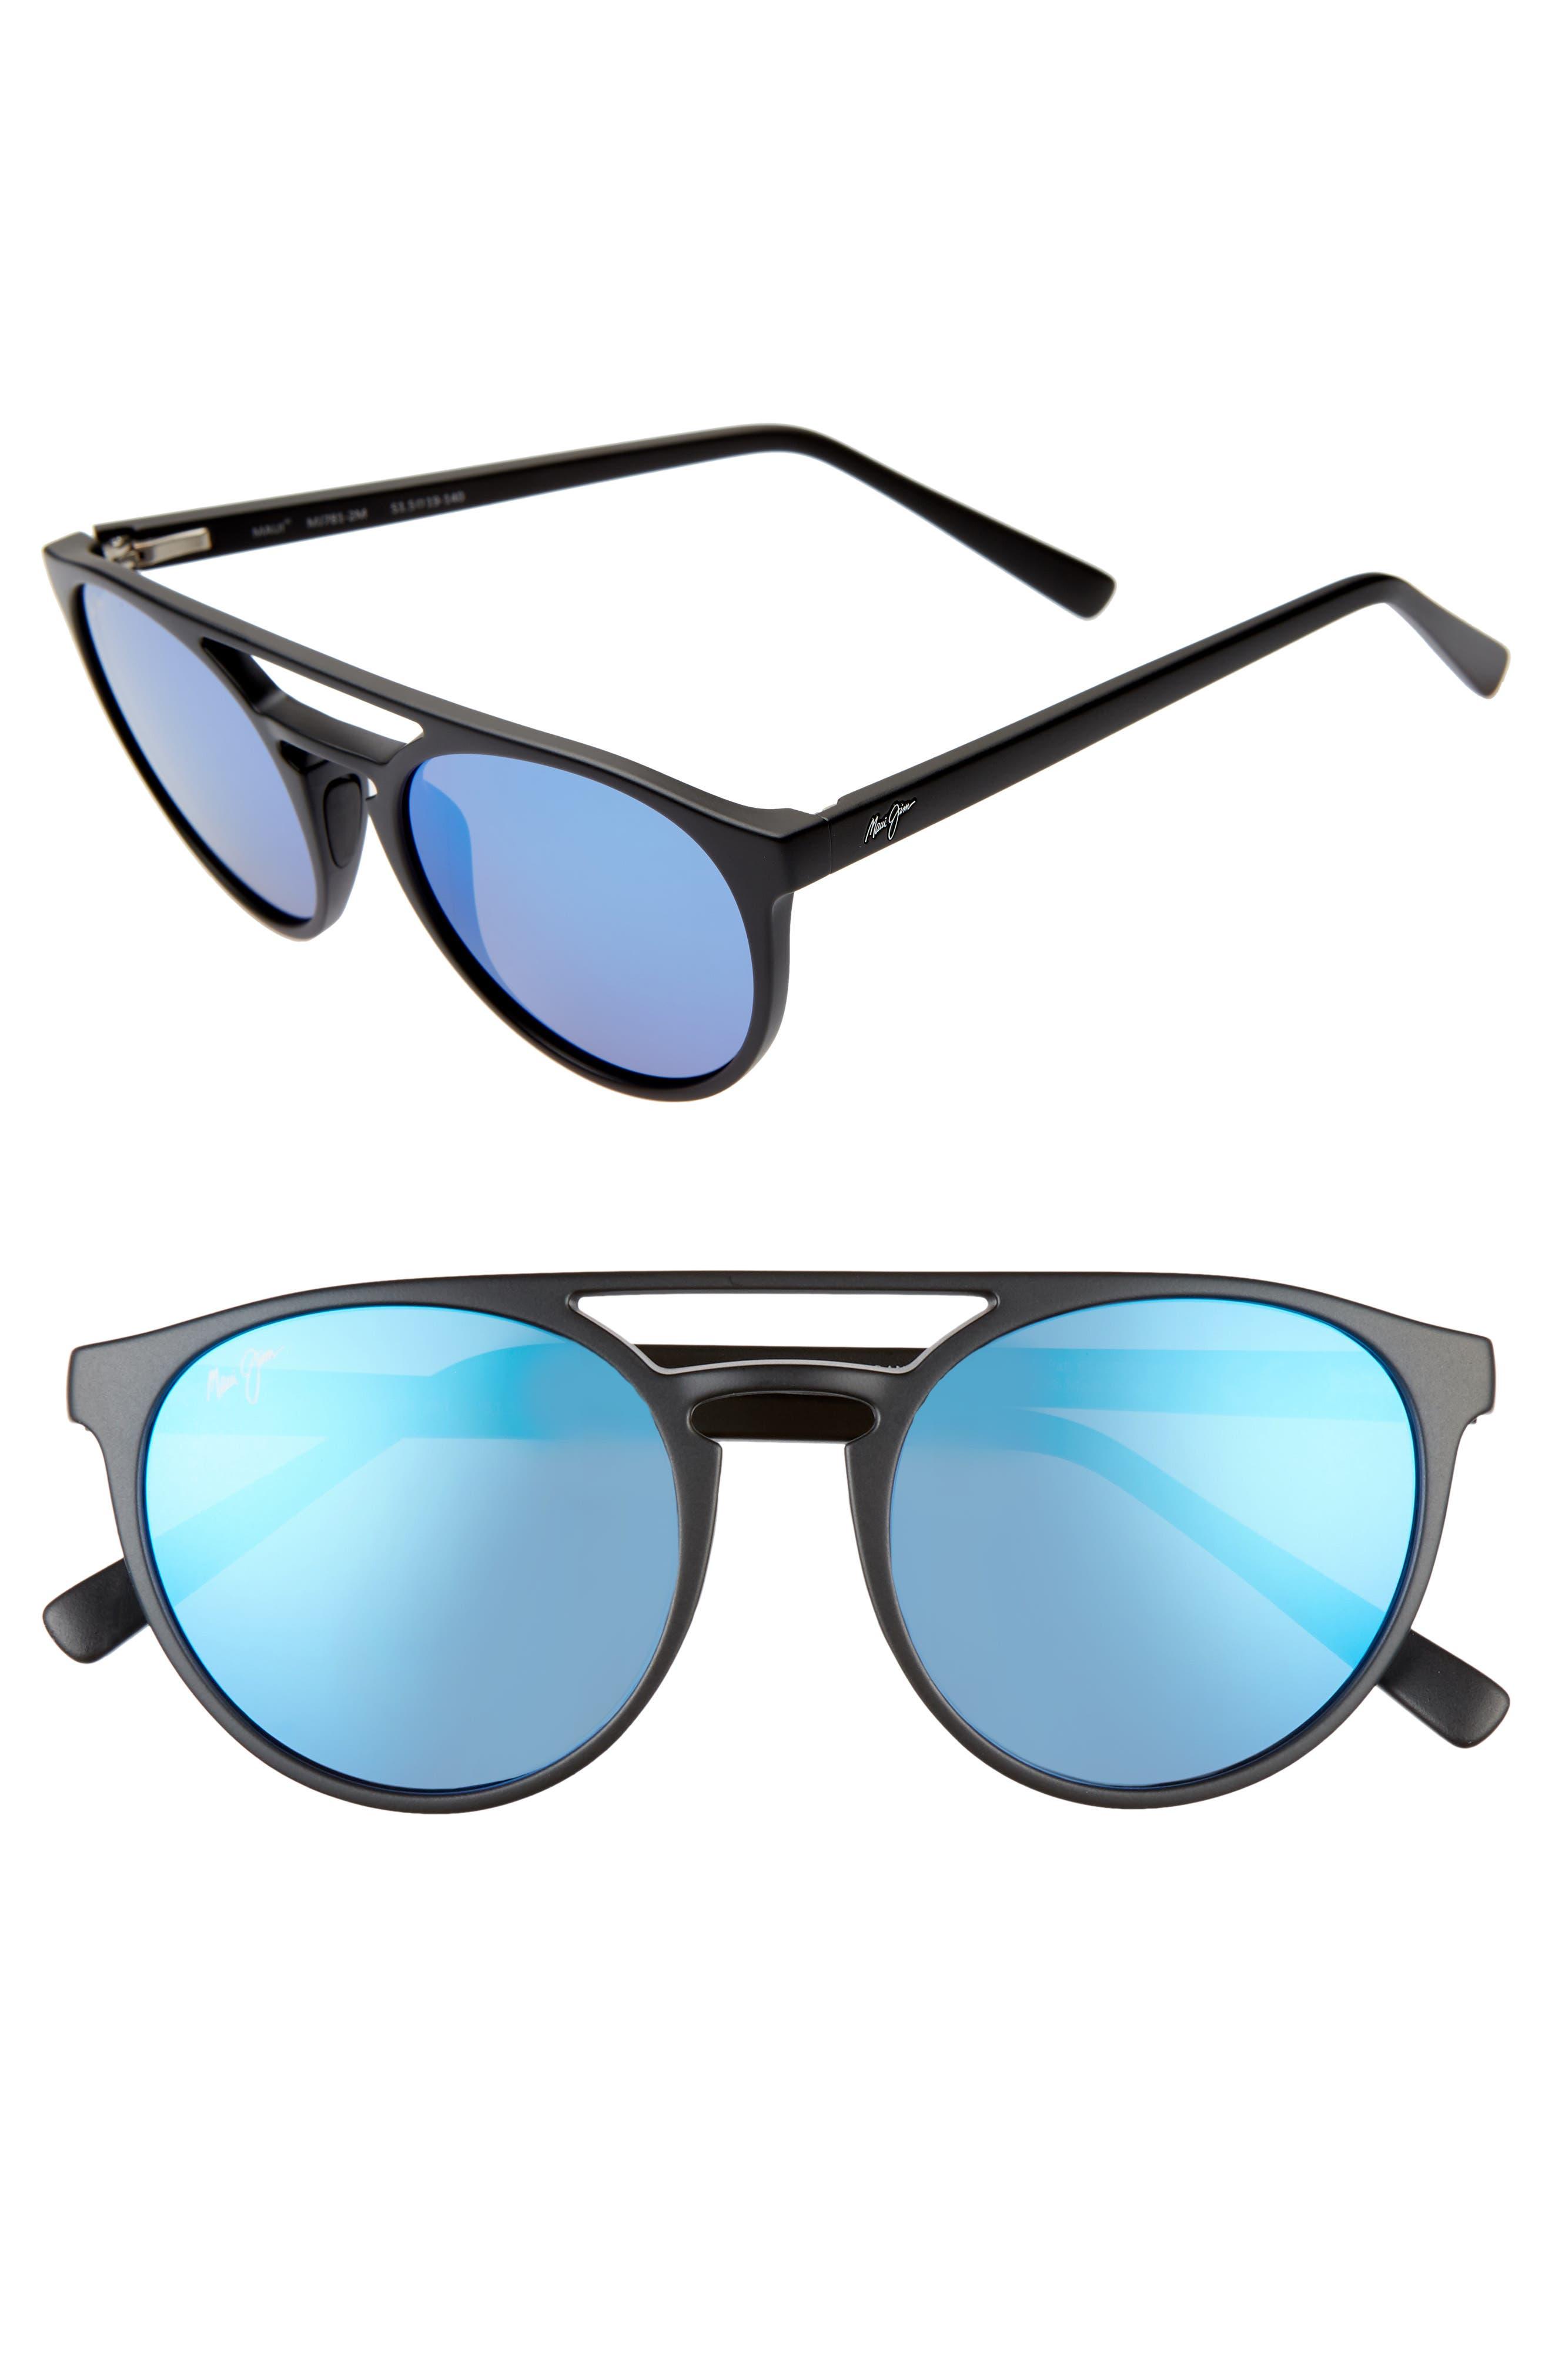 Maui Jim Ah Dang! 52Mm Polarizedplus2 Flat Top Sunglasses - Matte Black/ Blue Hawaii